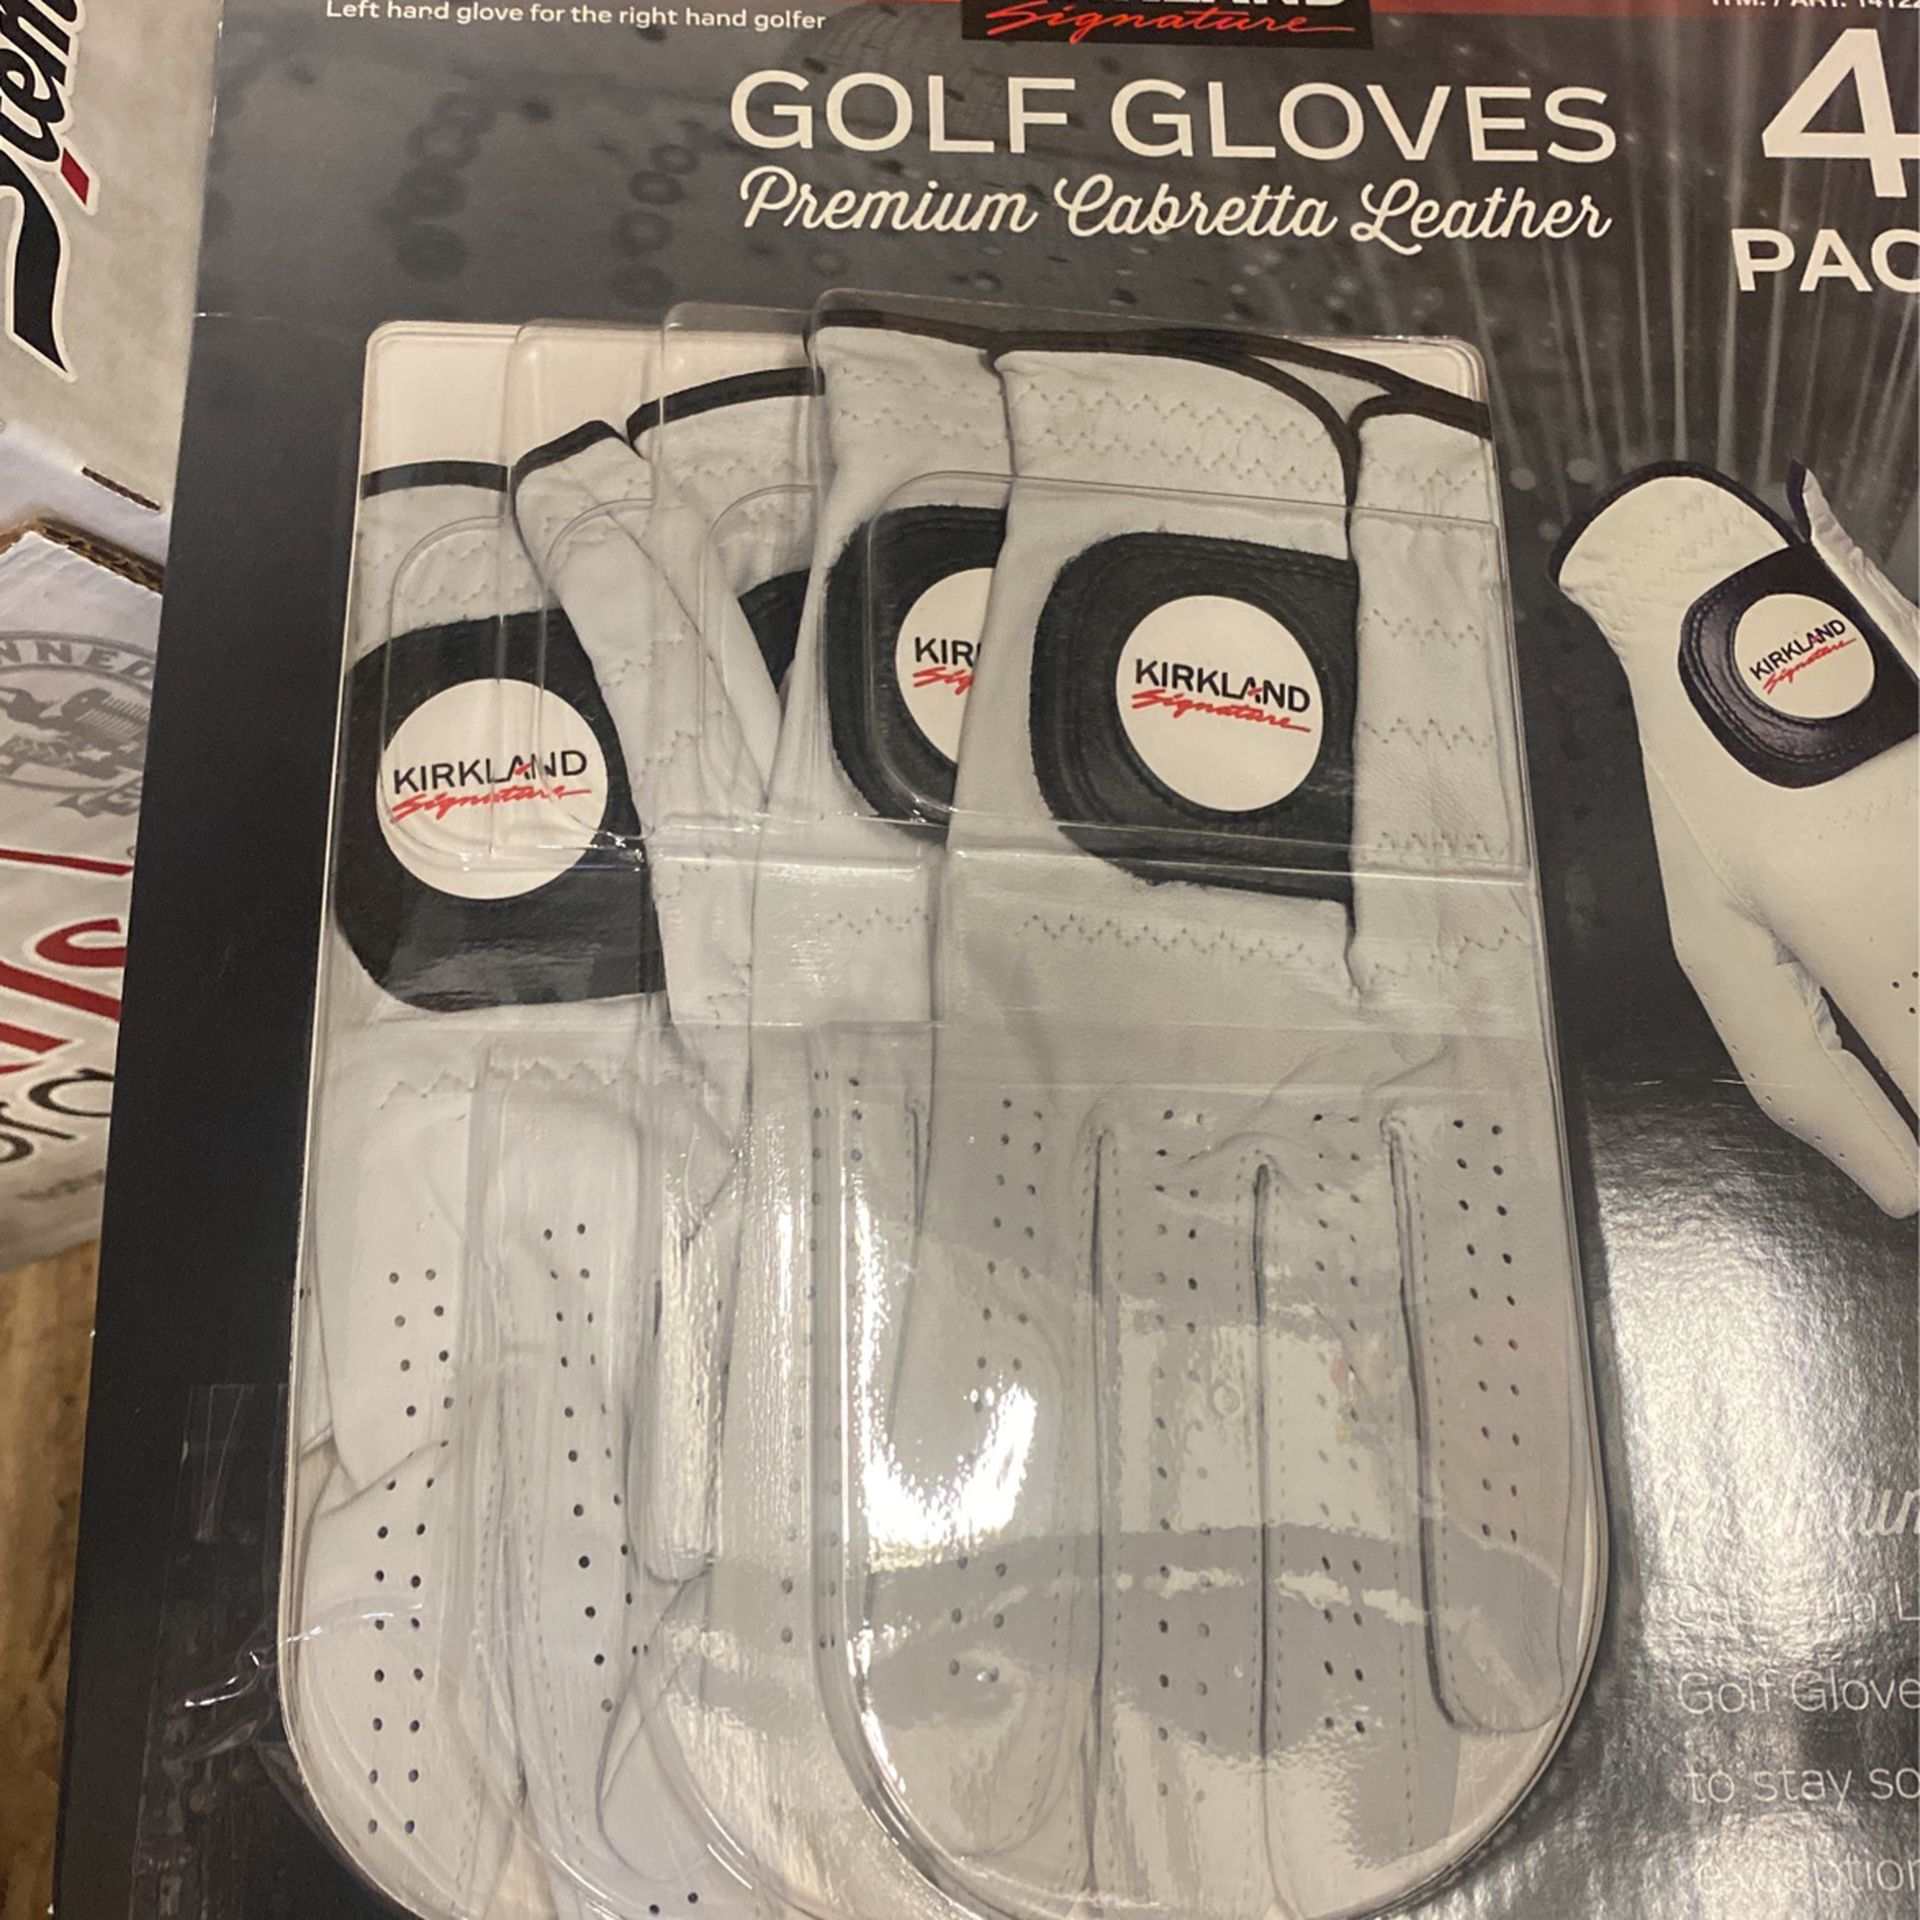 Golf Gloves - 4 Pack (small, Medium And Medium/Large Sizes)